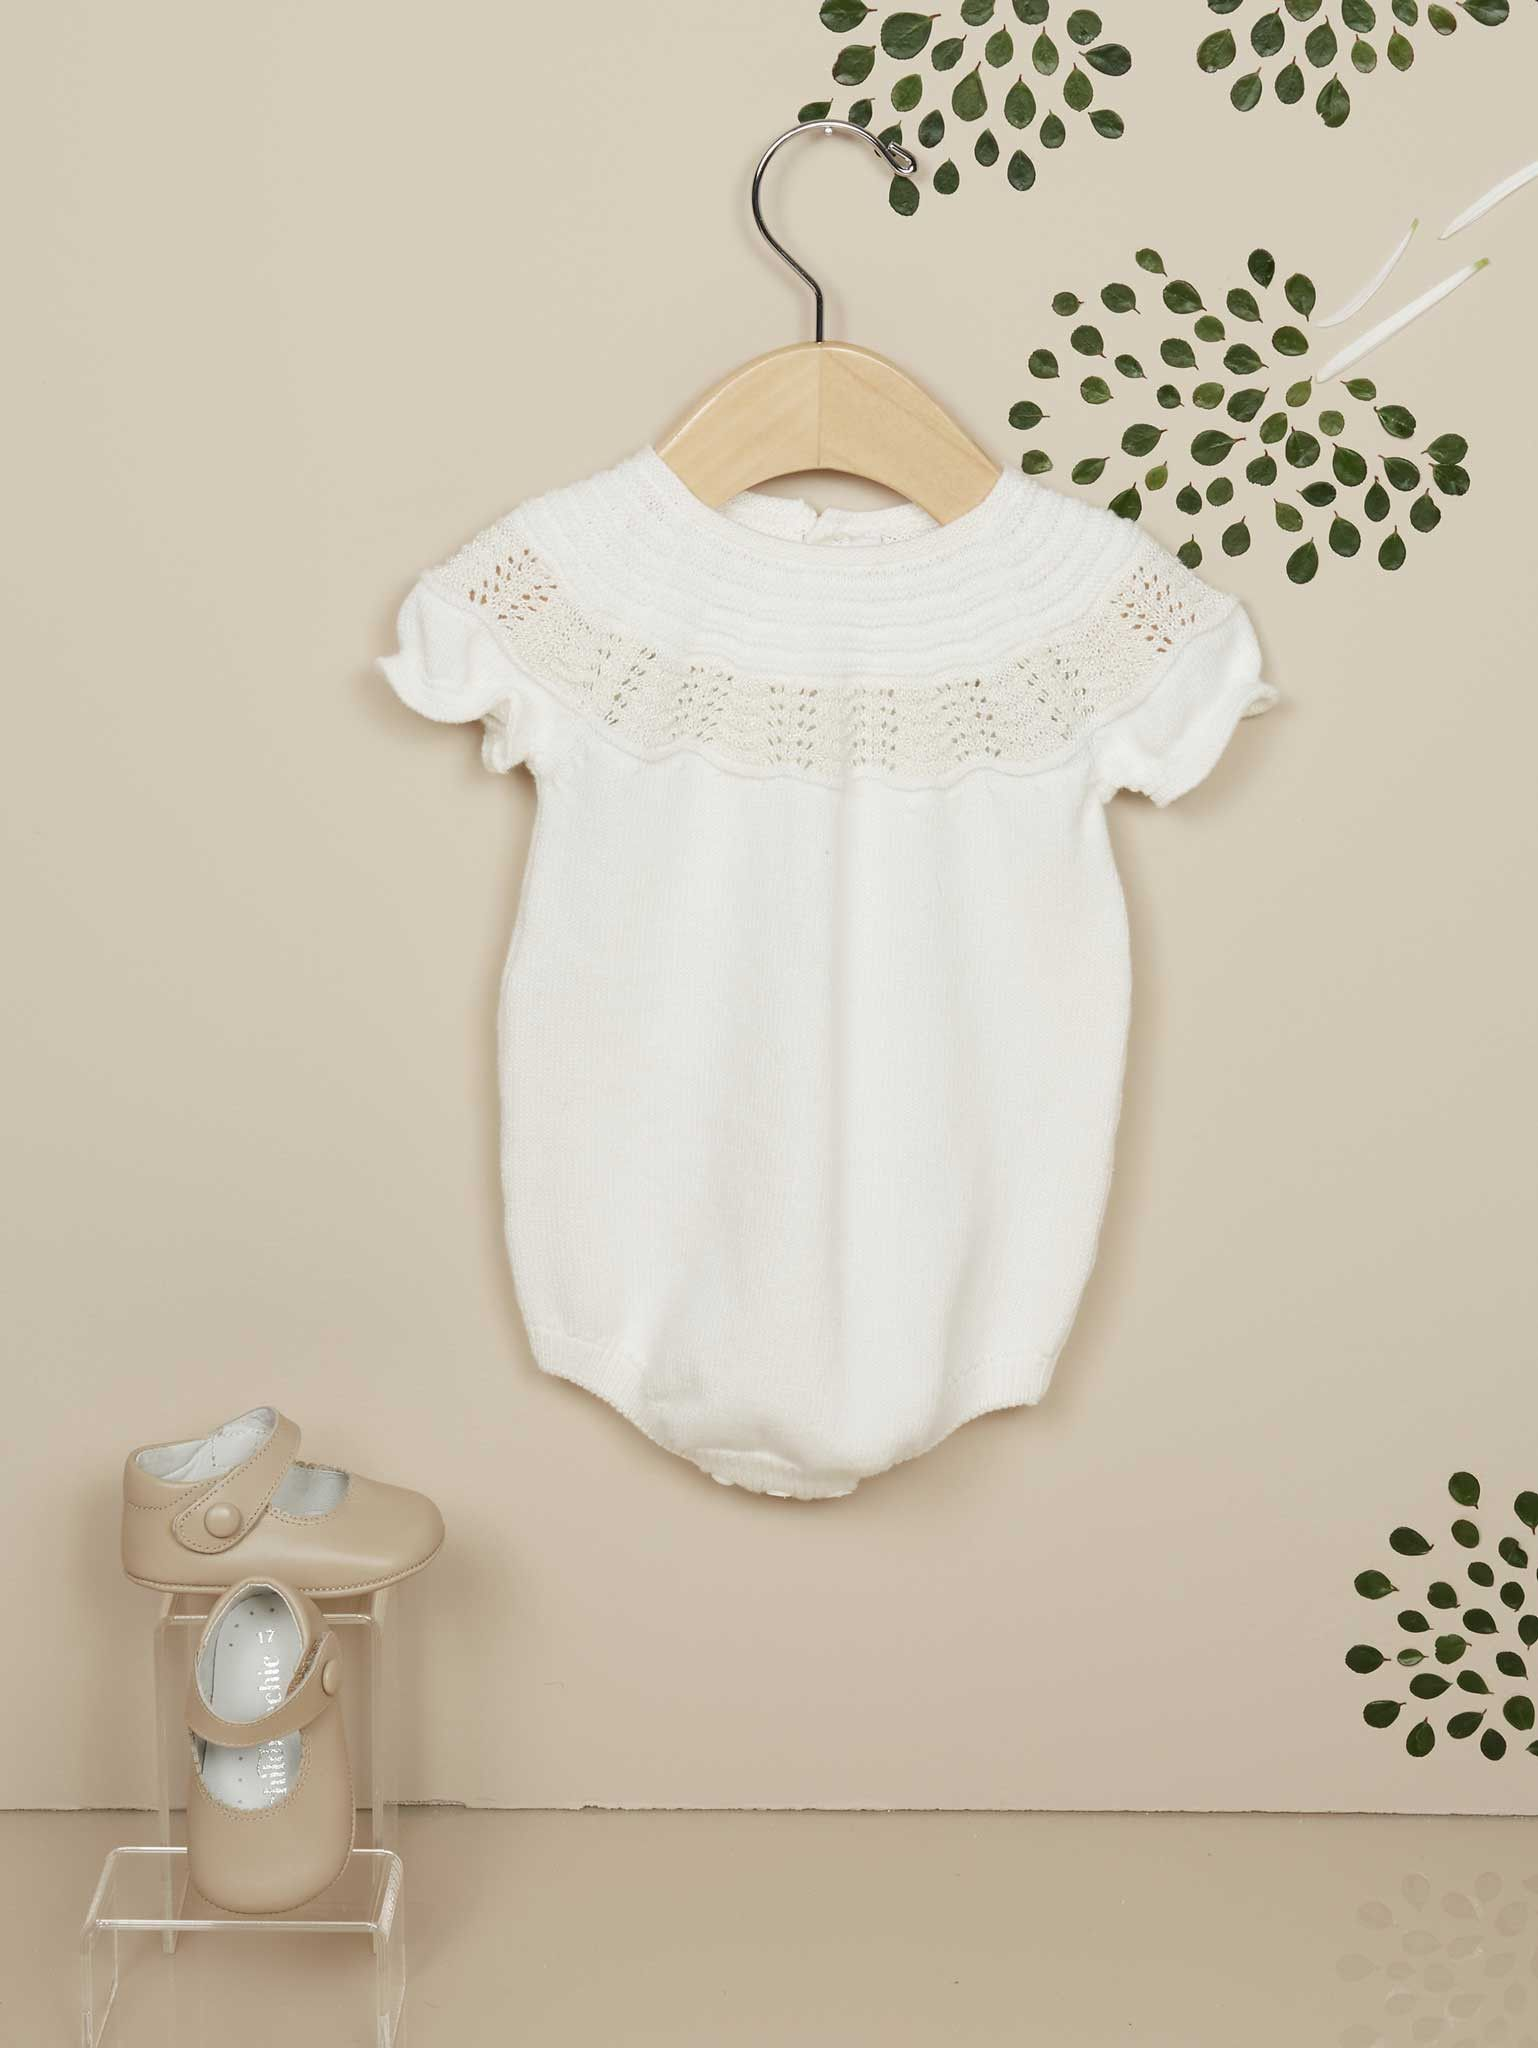 Chic Baby Girl Ivory Knit Romper